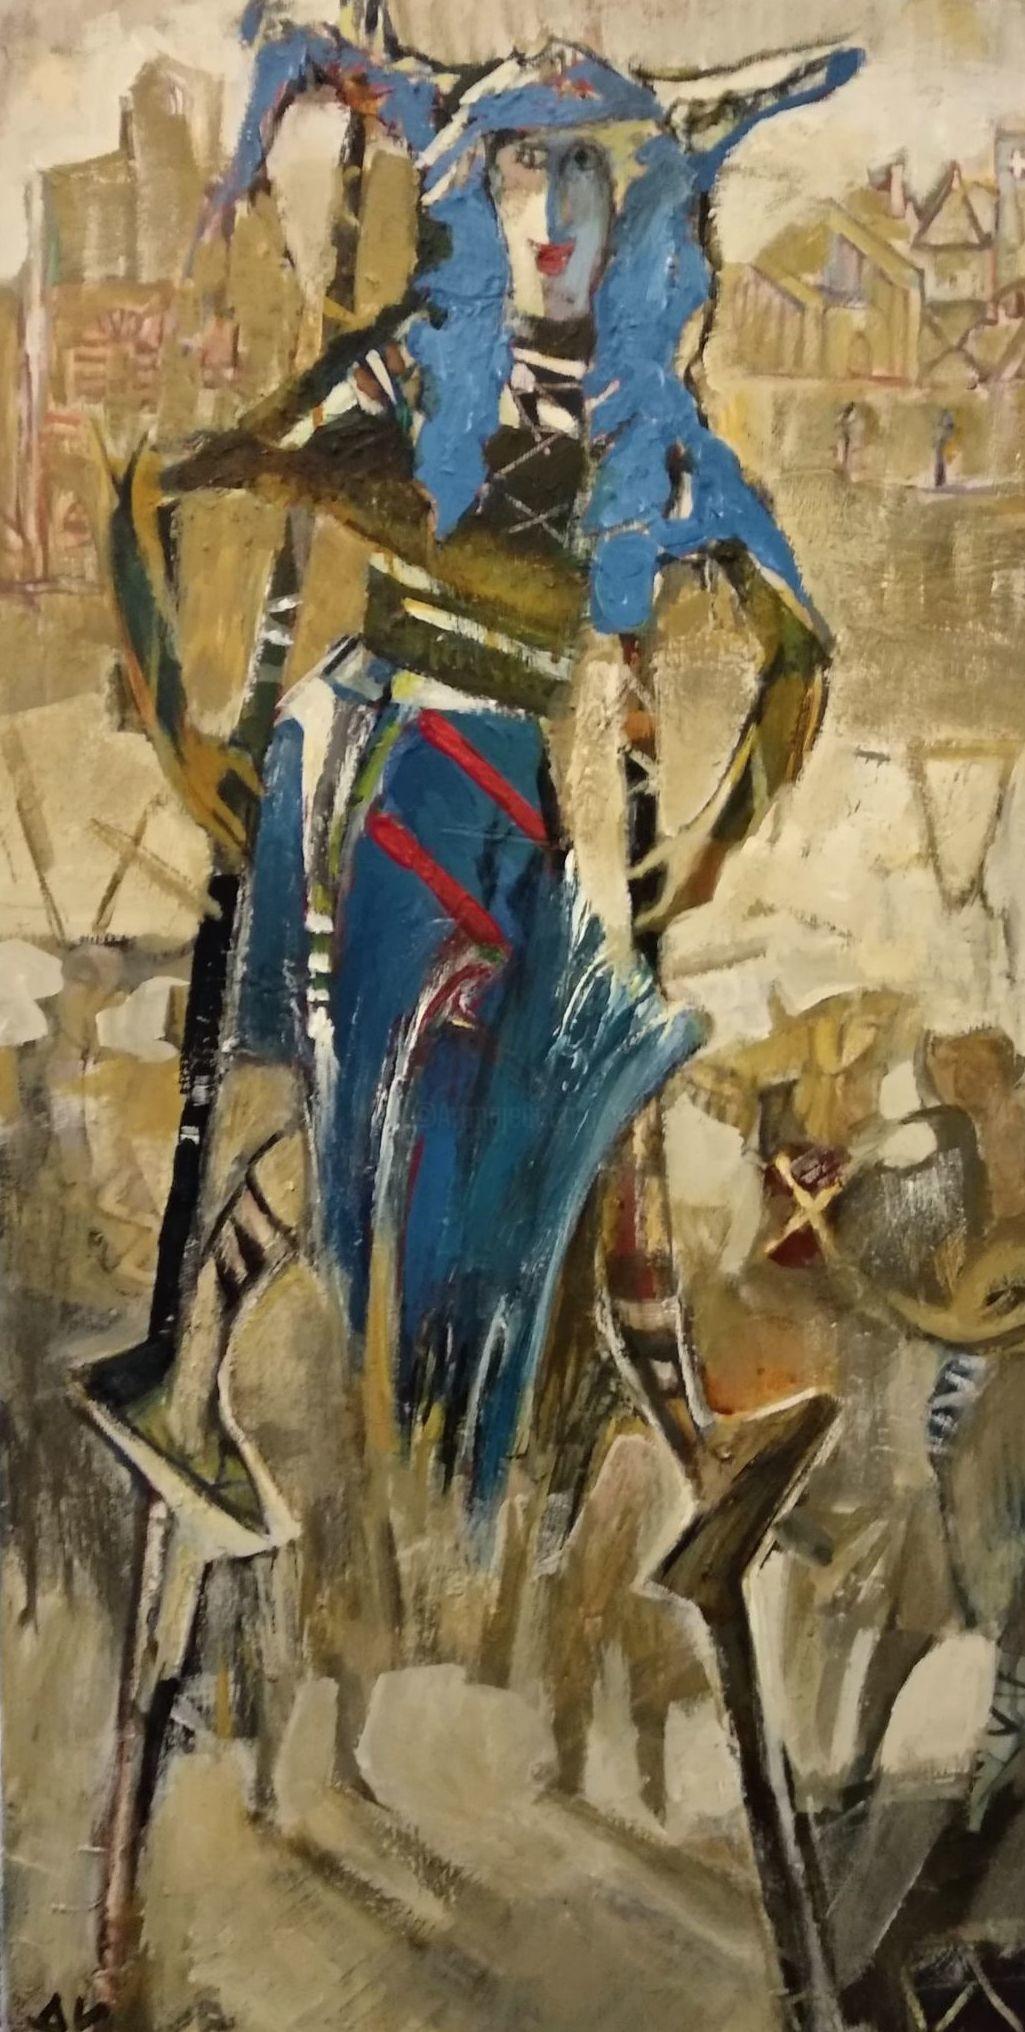 Galya Didur - Stilts